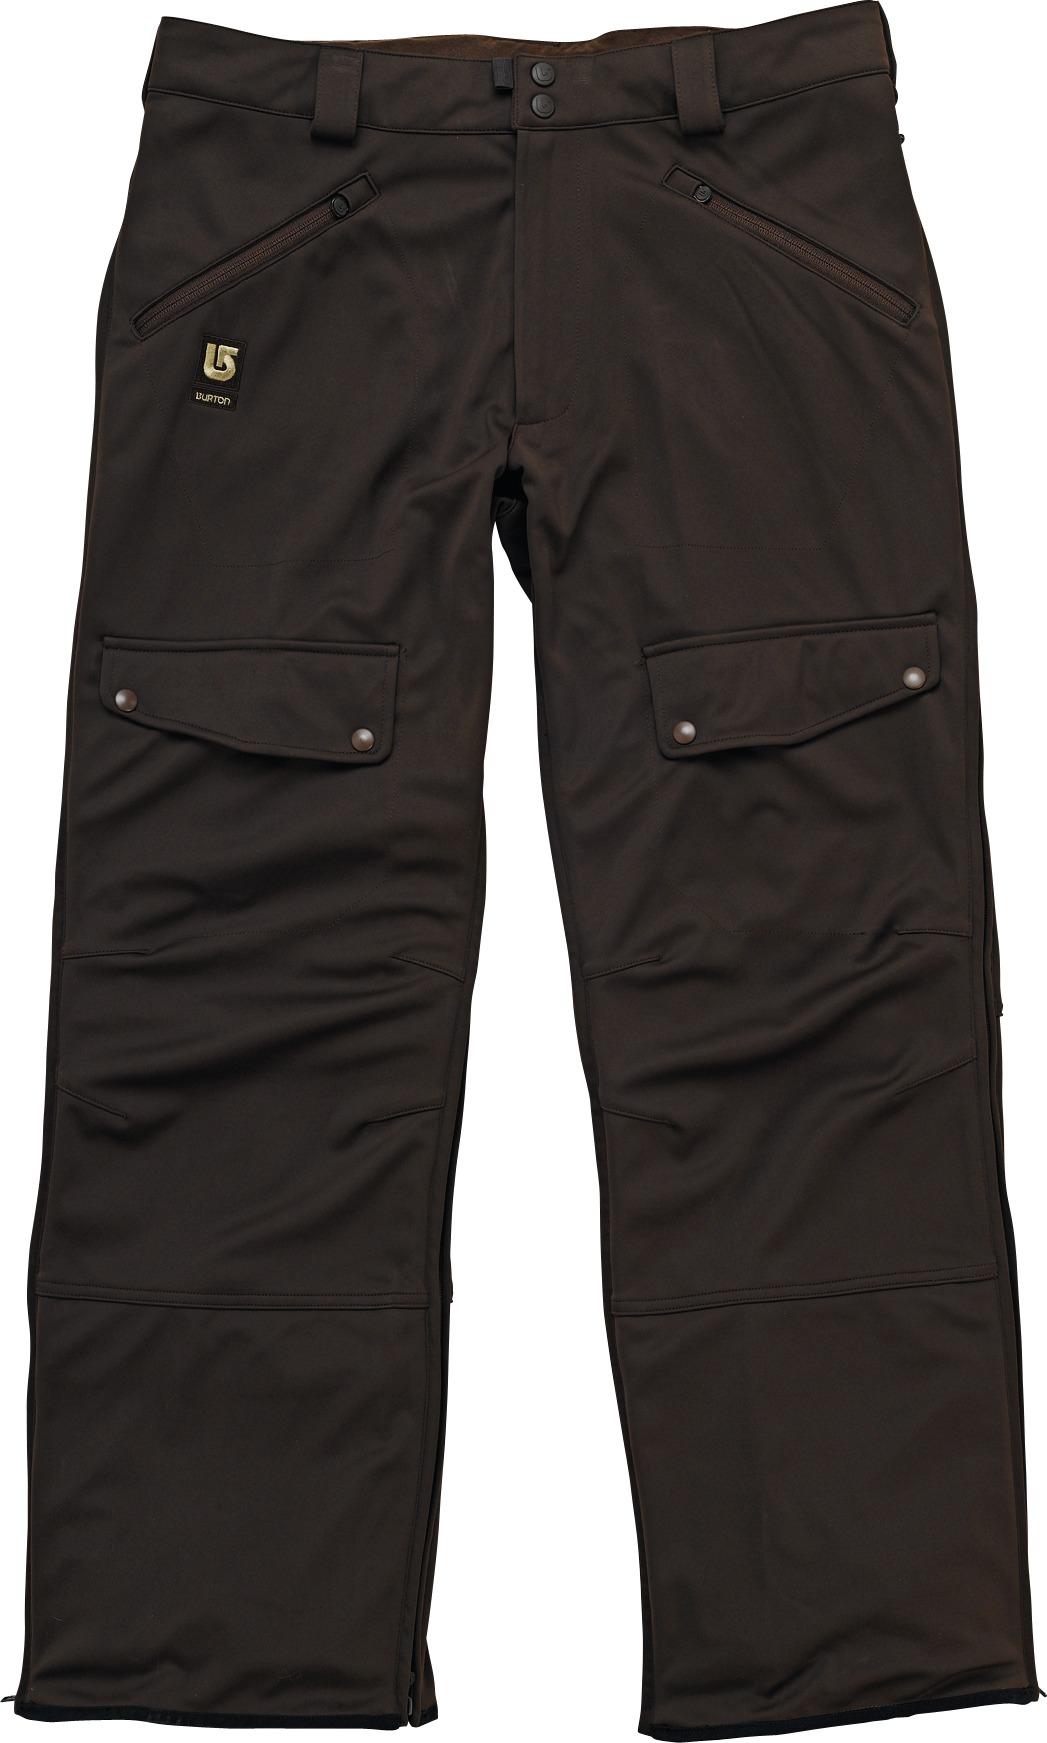 Spodnie Snowboardowe Burton Gore Softshell (Mocha)